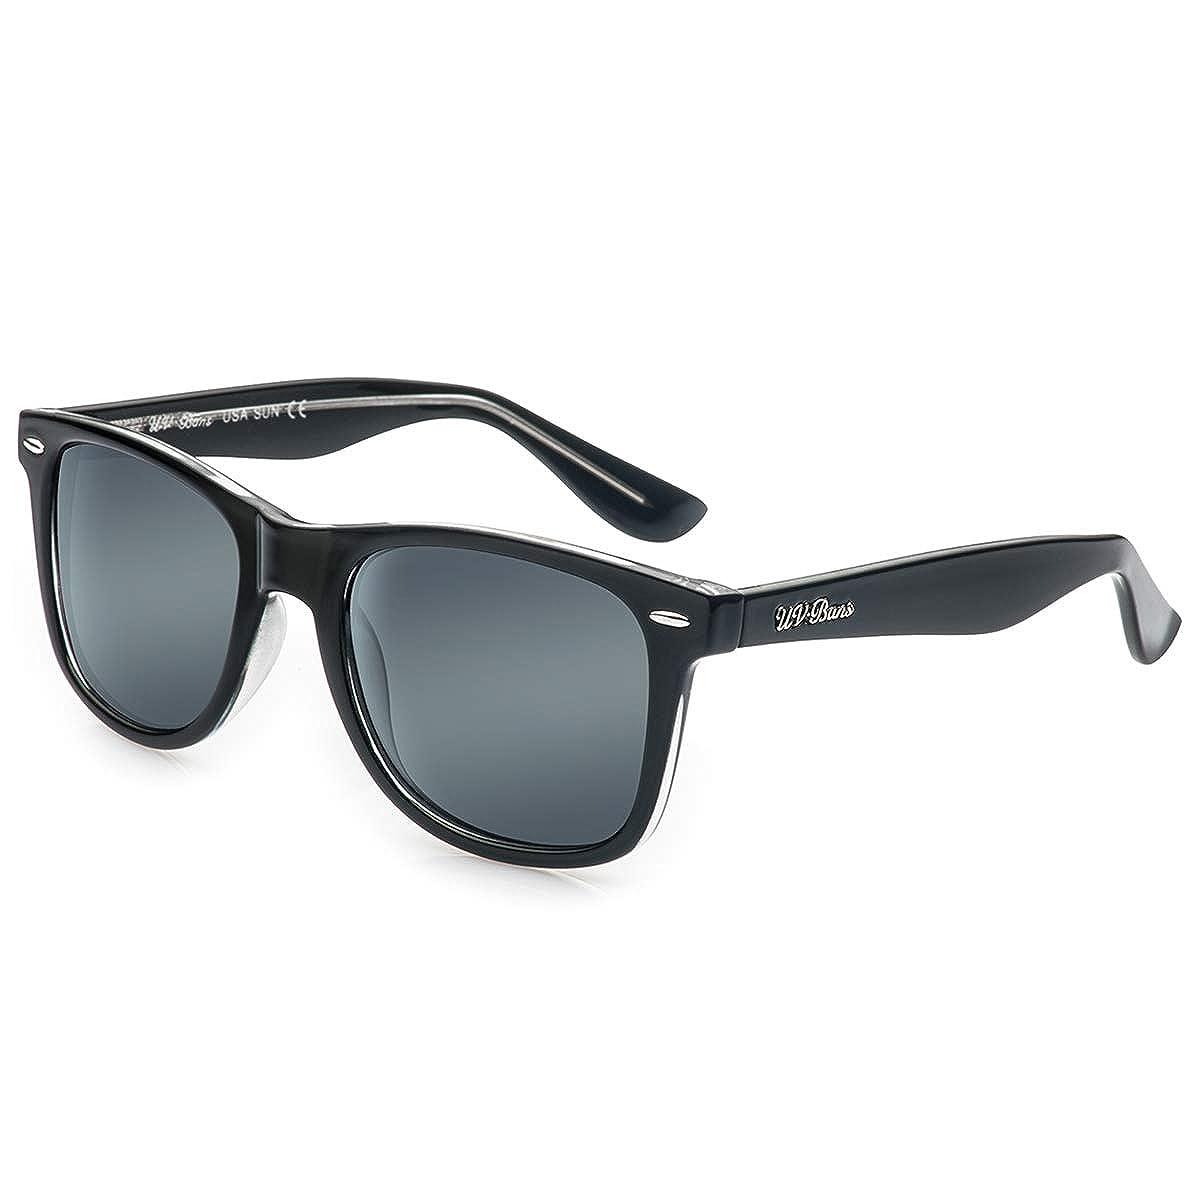 f3d0f724fecd Amazon.com  UV-BANS Polarized Sunglasses for Men Women 100% UV400  Protection (Black designer sunglasses)  Clothing